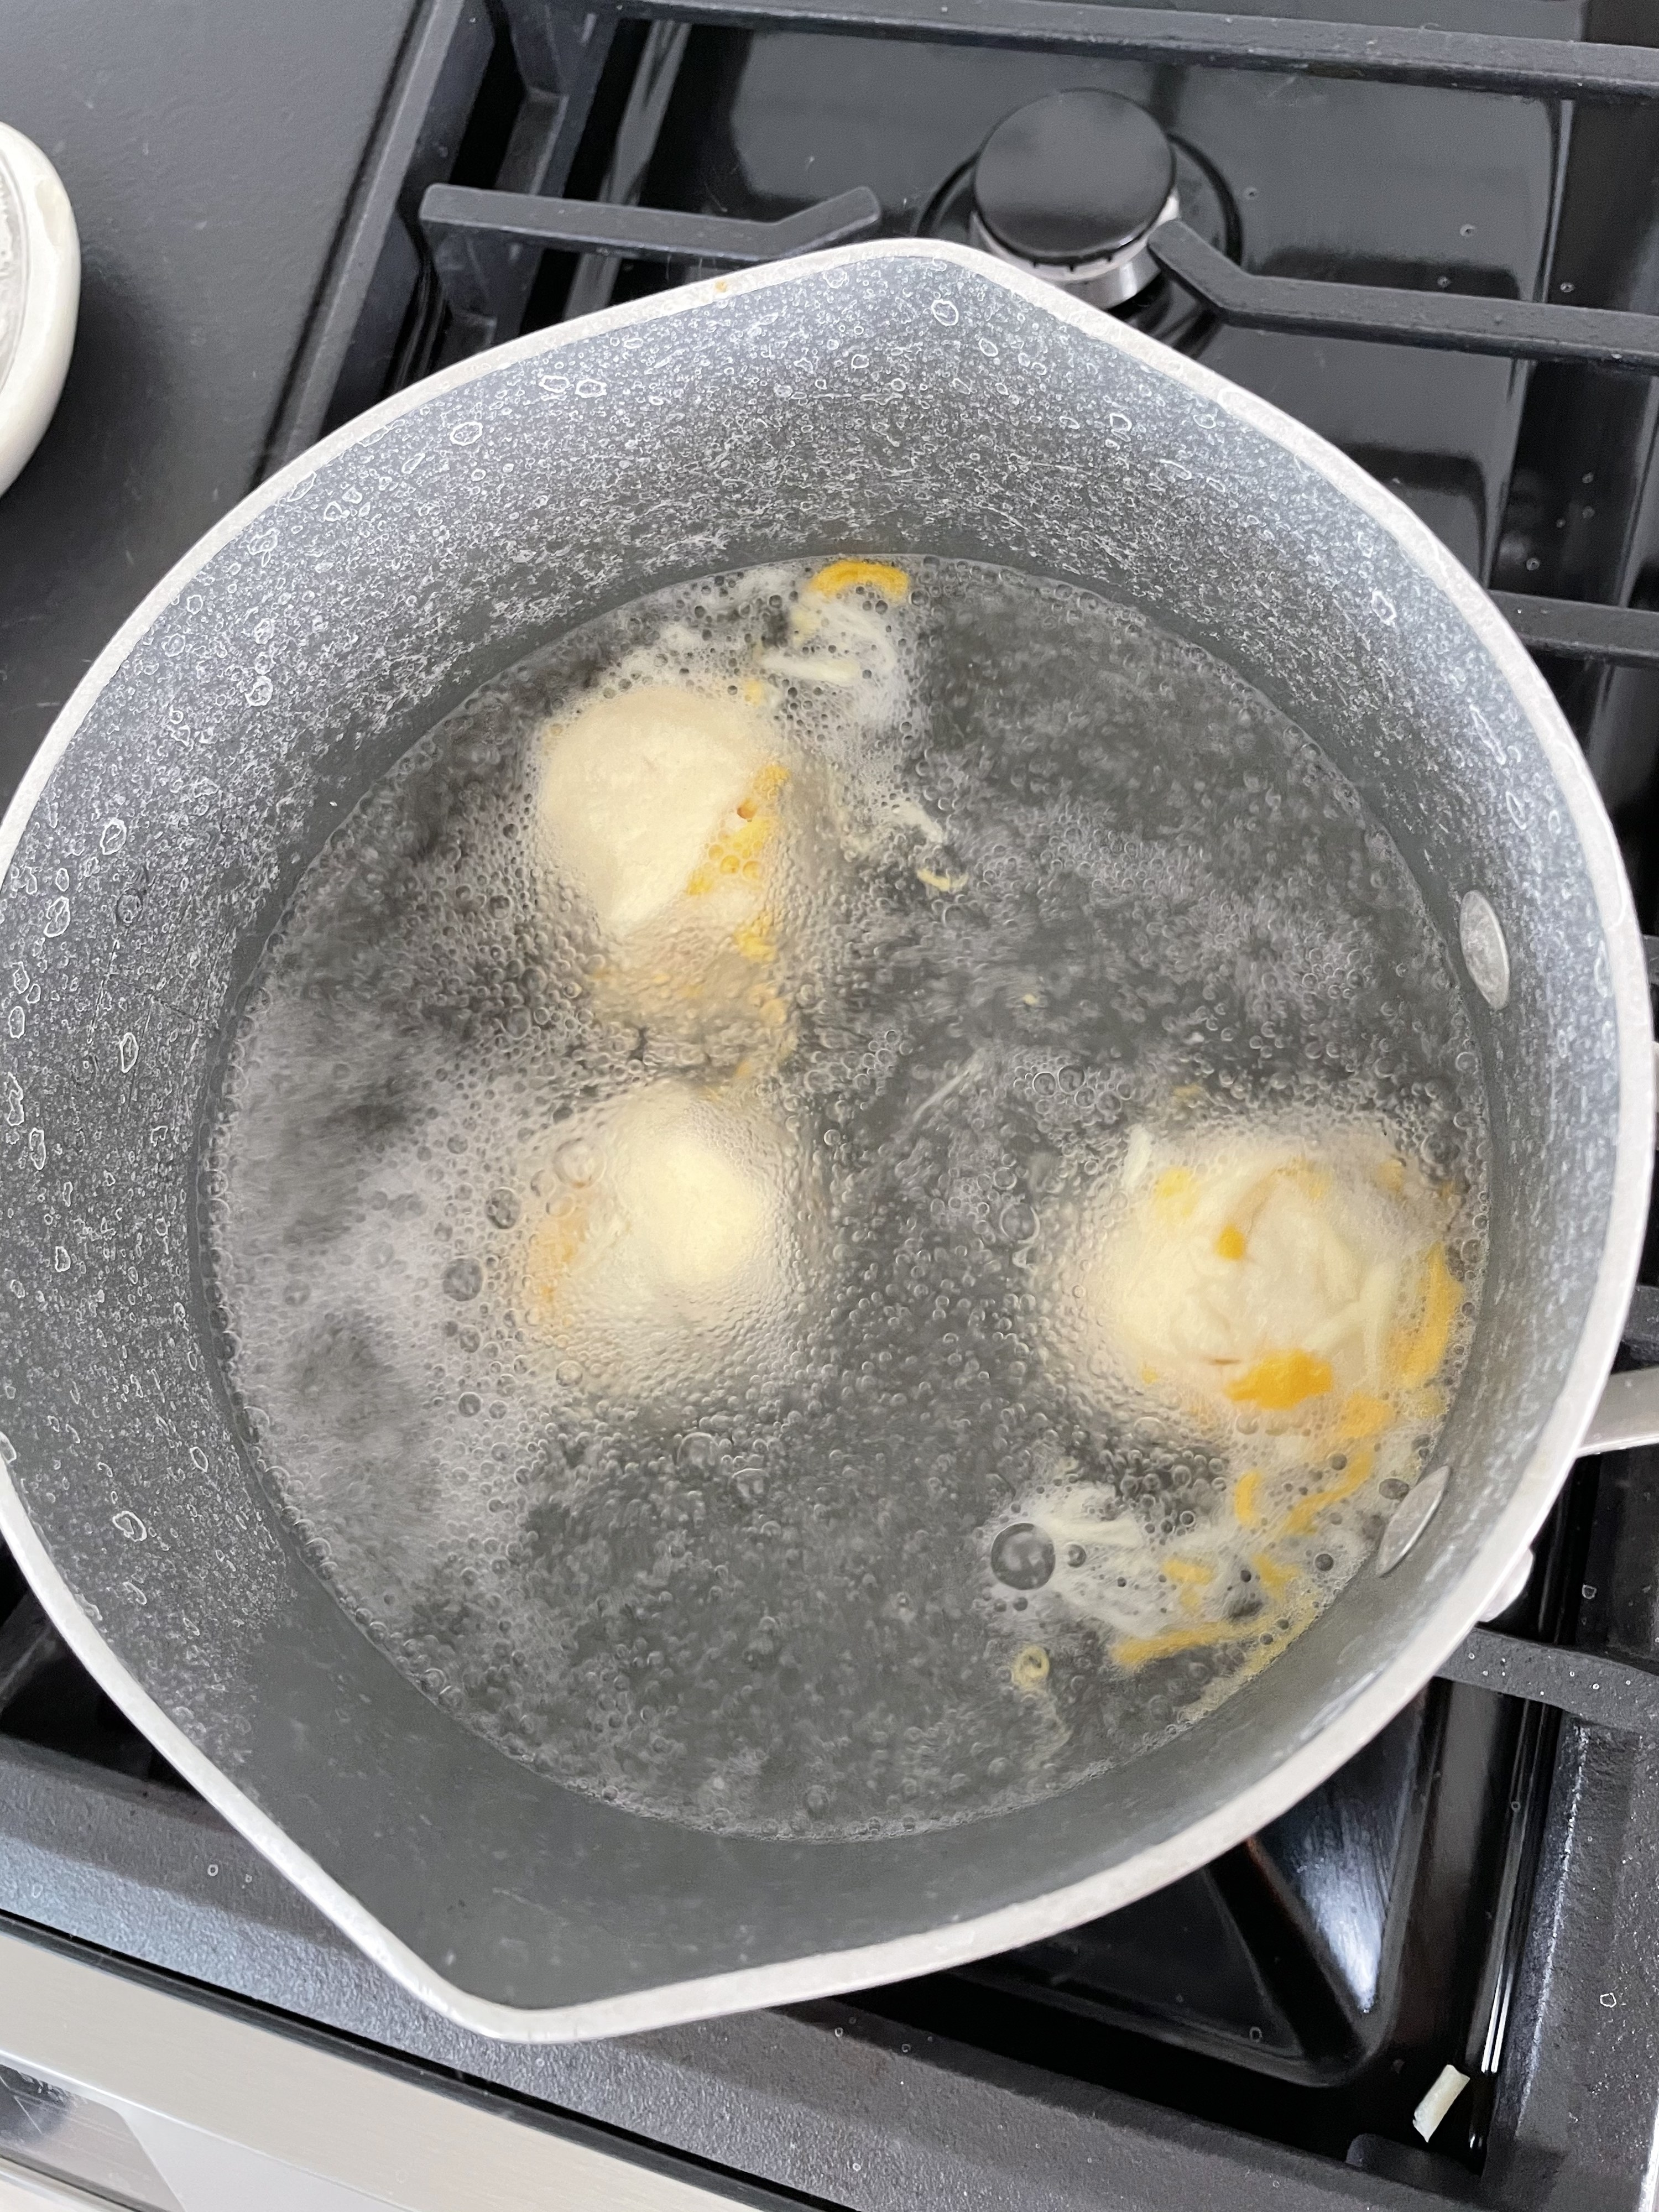 Pretzel dough balls in a baking soda bath